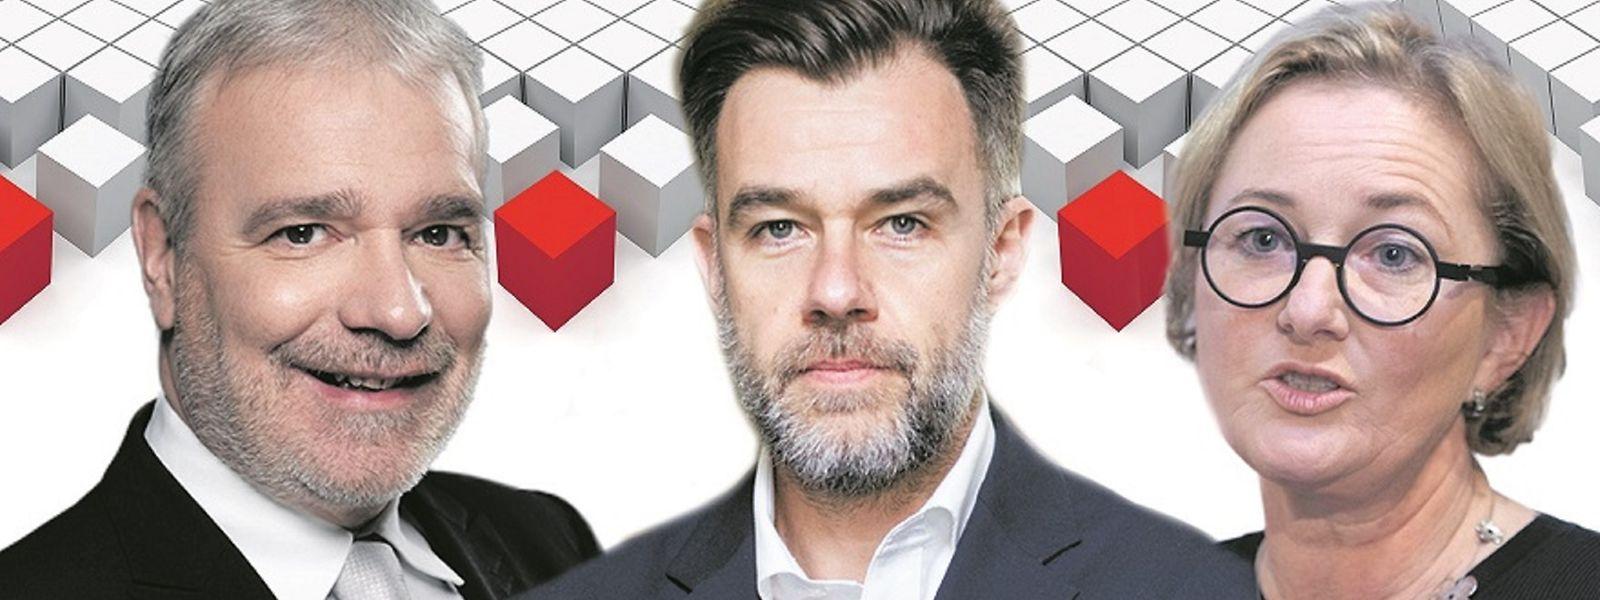 Zu Dan Kersch, Franz Fayot und Paulette Lenert (v.l.n.r.) wird sich nach dem nächsten LSAP-Kongress noch das neue Gesicht an der Parteispitze gesellen.